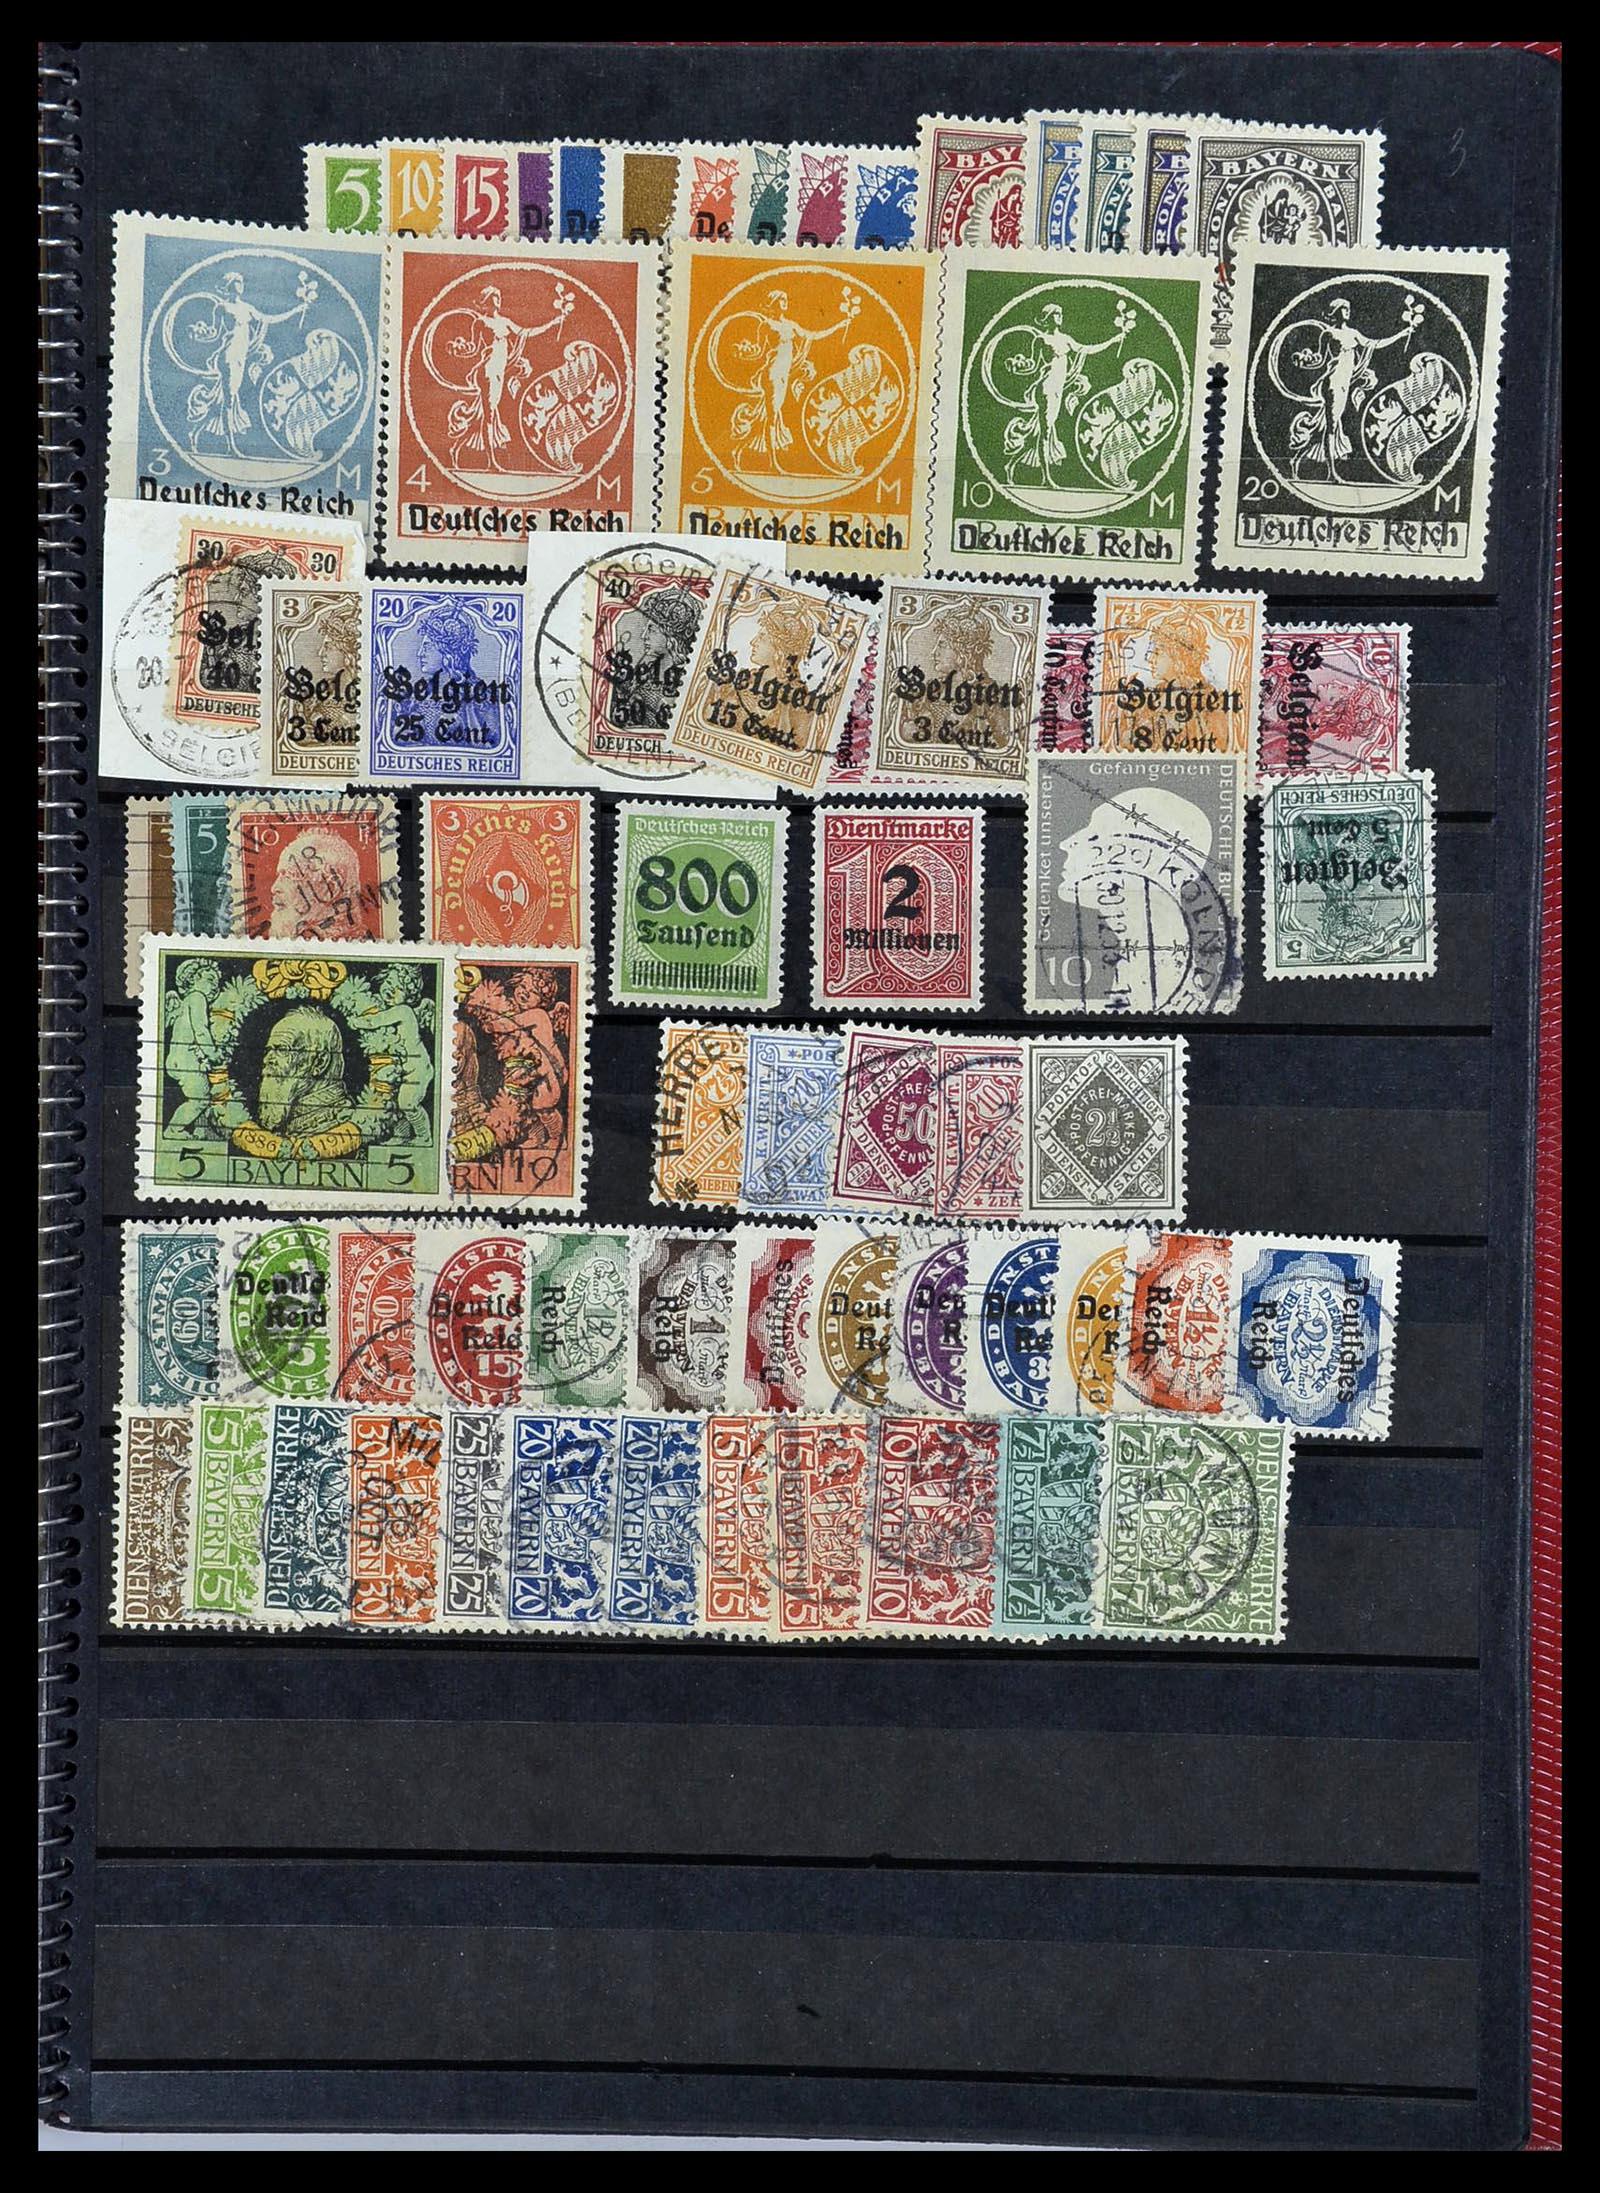 34169 009 - Postzegelverzameling 34169 Duitsland 1880-1955.